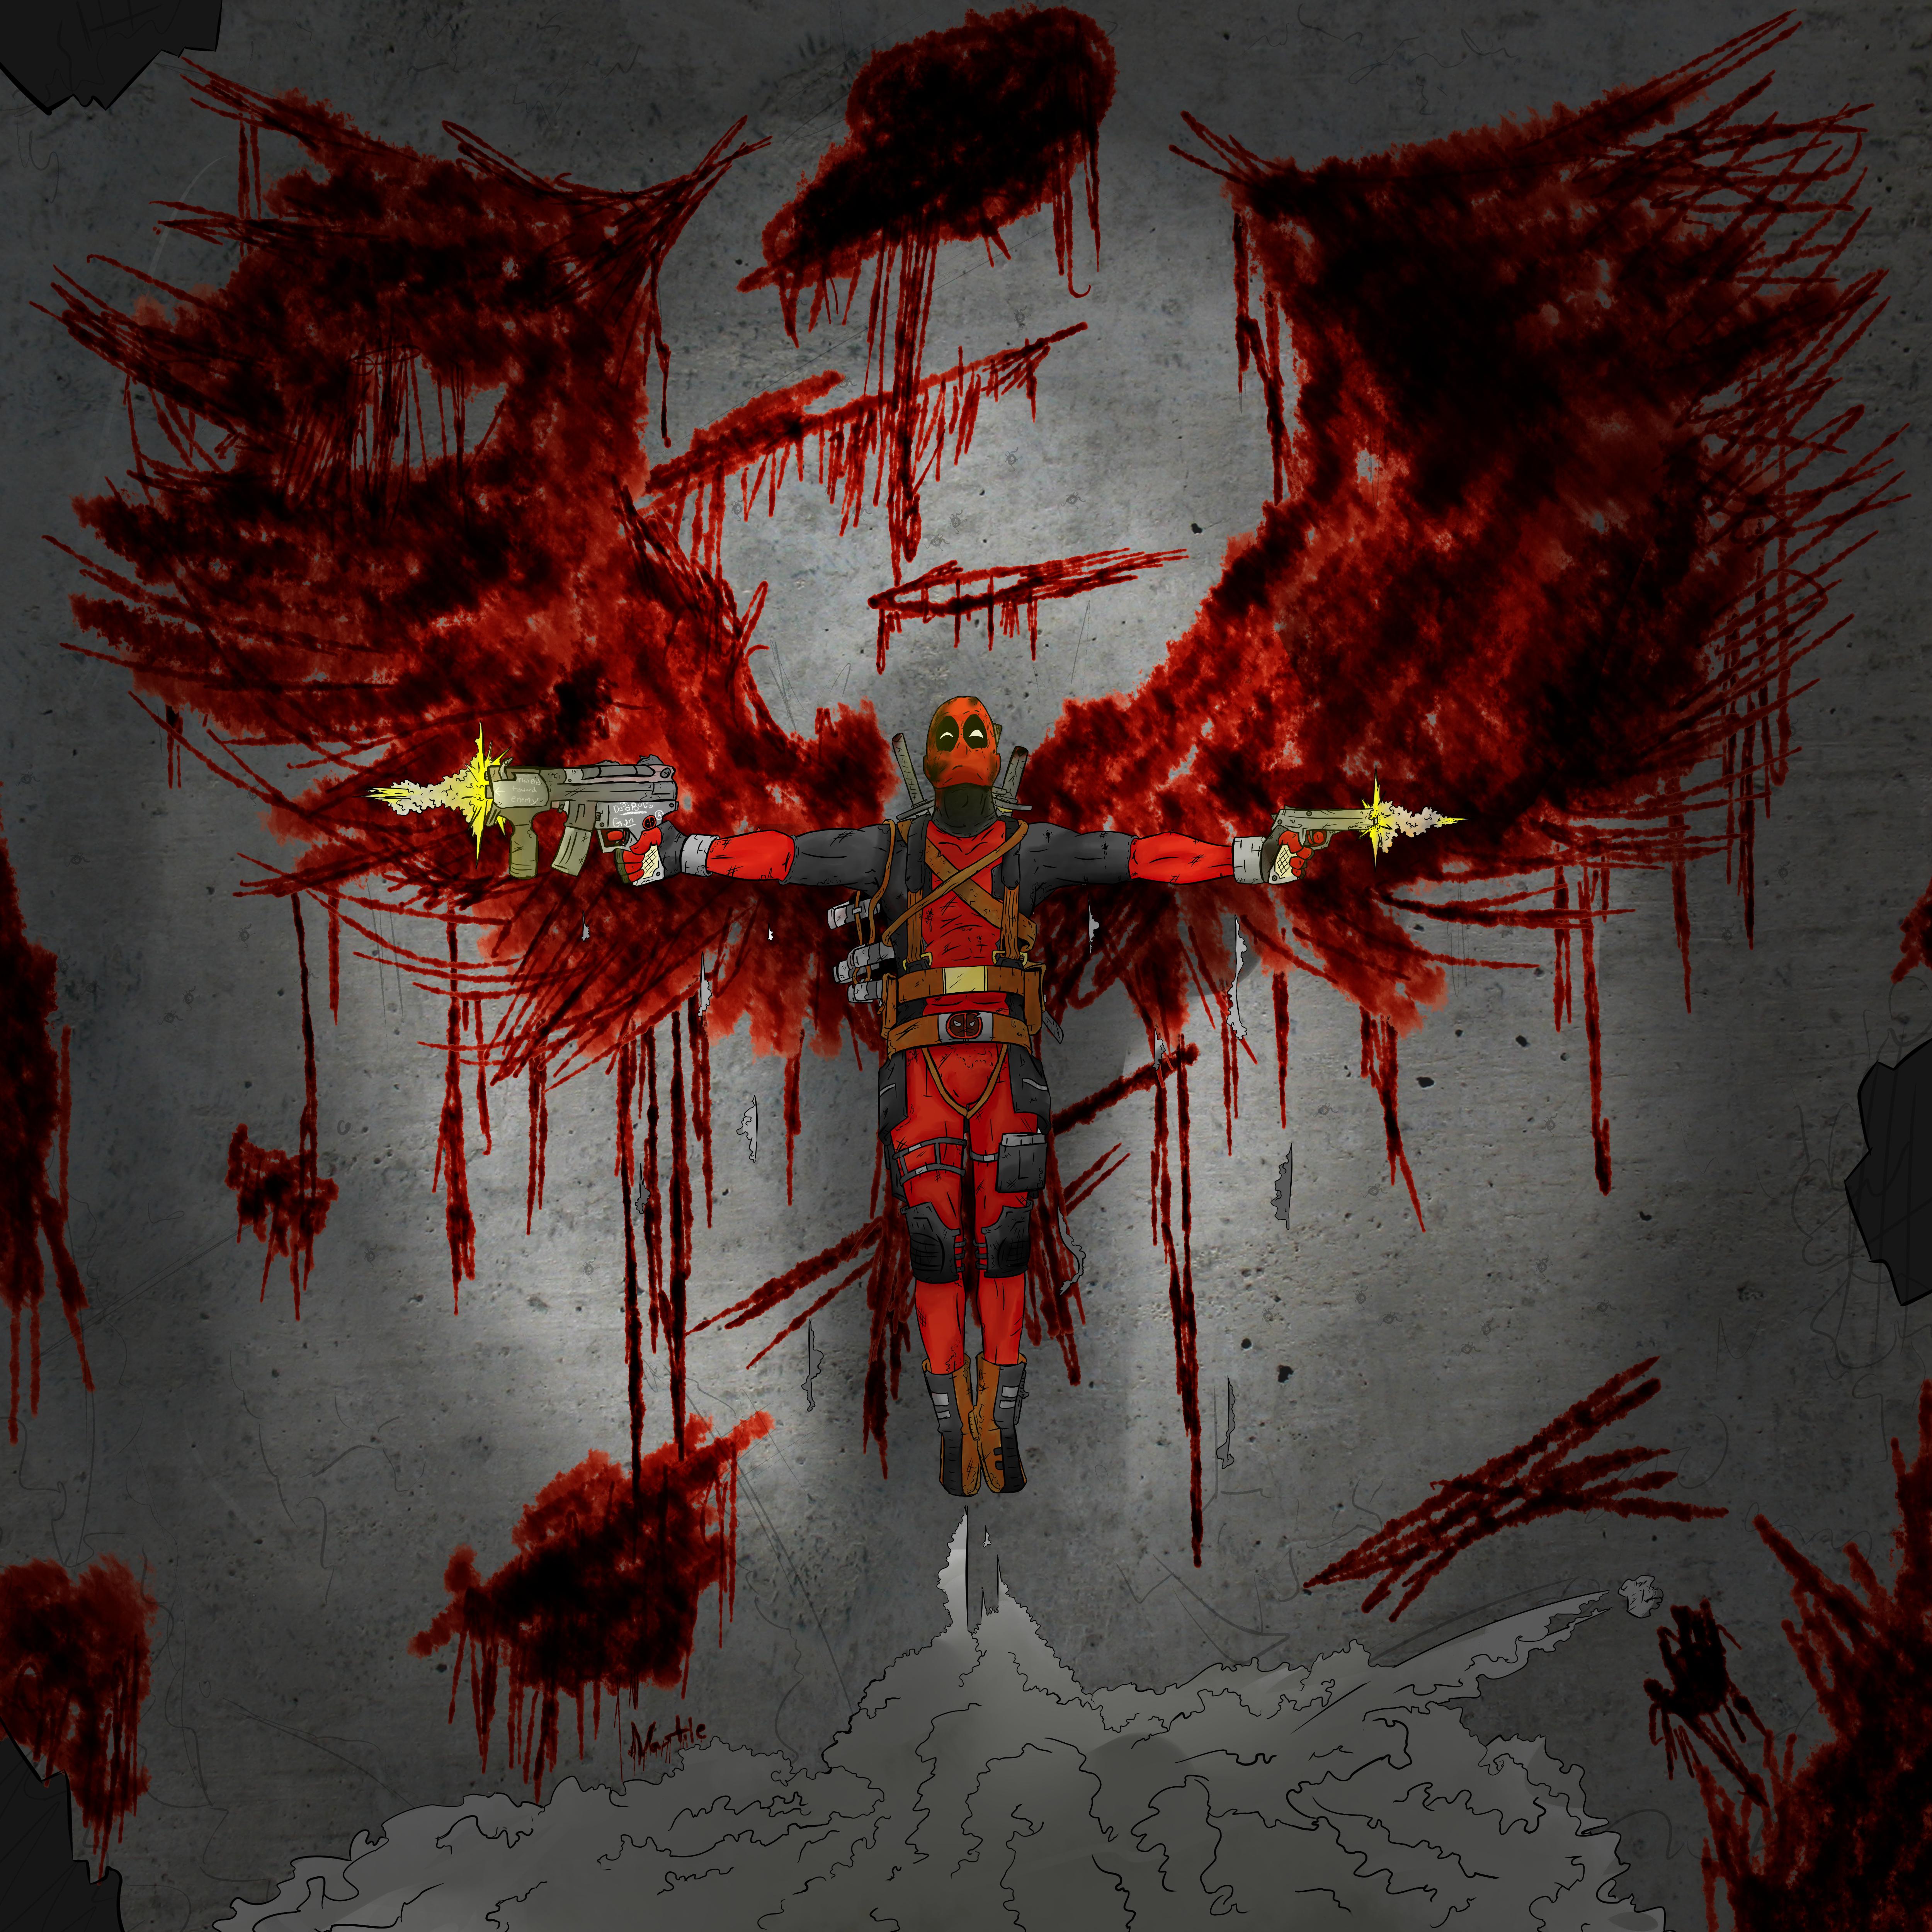 The Angel of Deadpool